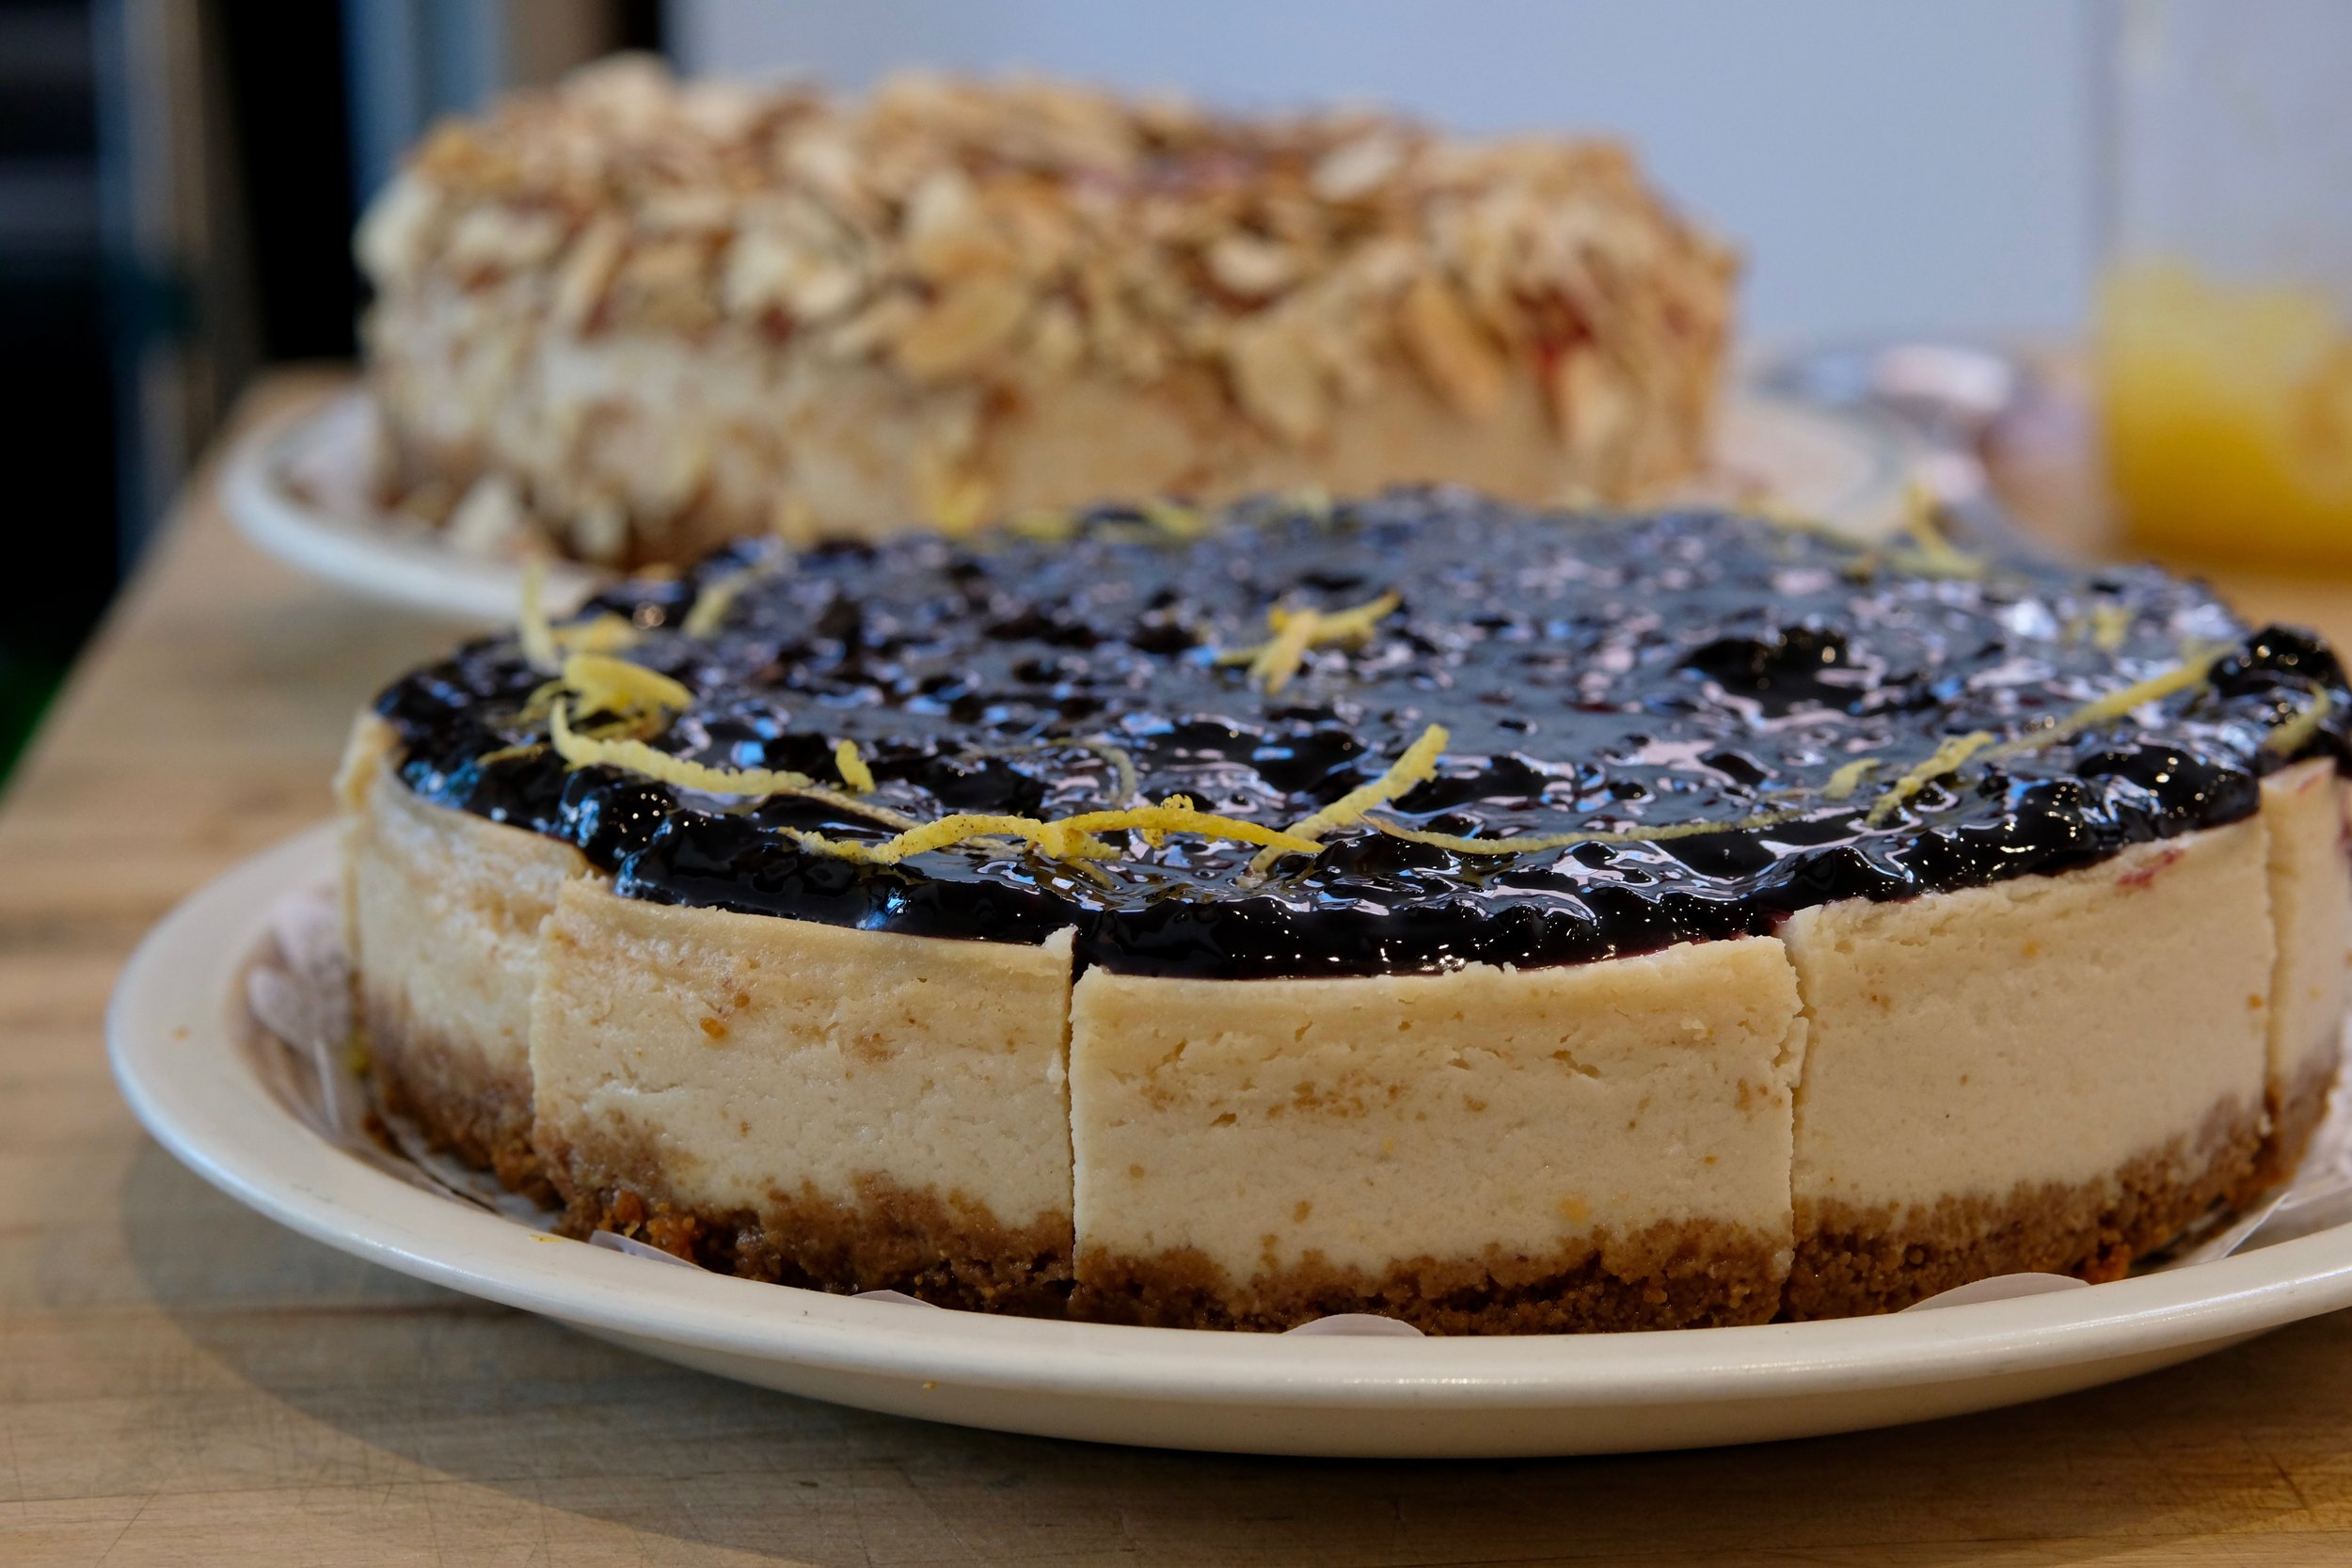 Blackberry lemon cheesecake